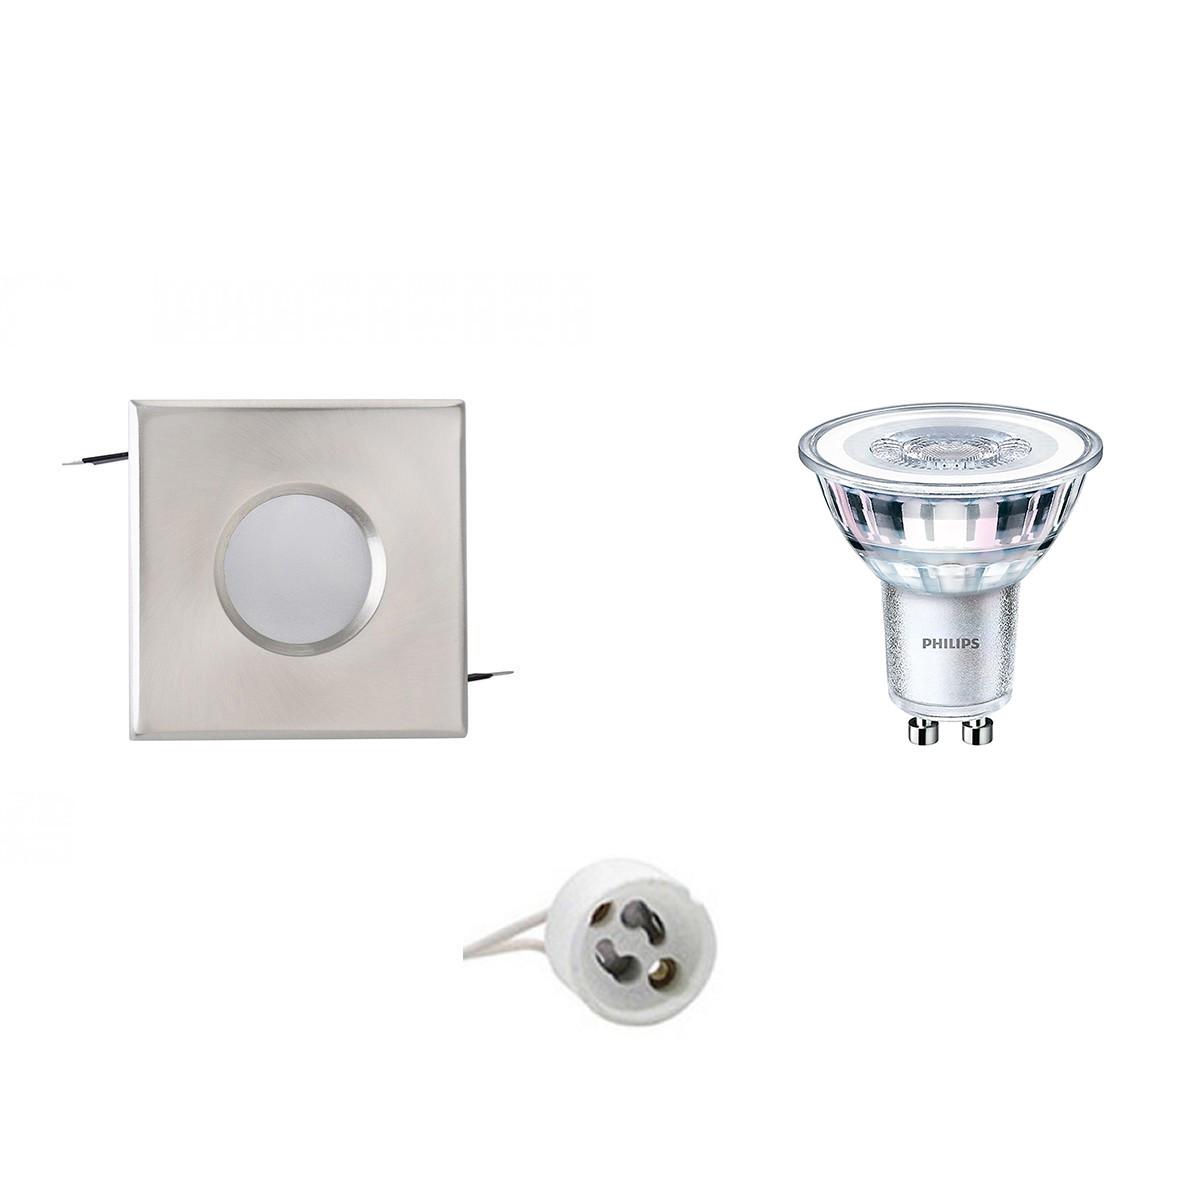 PHILIPS - LED Spot Set - CorePro 830 36D - Aigi - GU10 Fitting - Waterdicht IP65 - Dimbaar - Inbouw